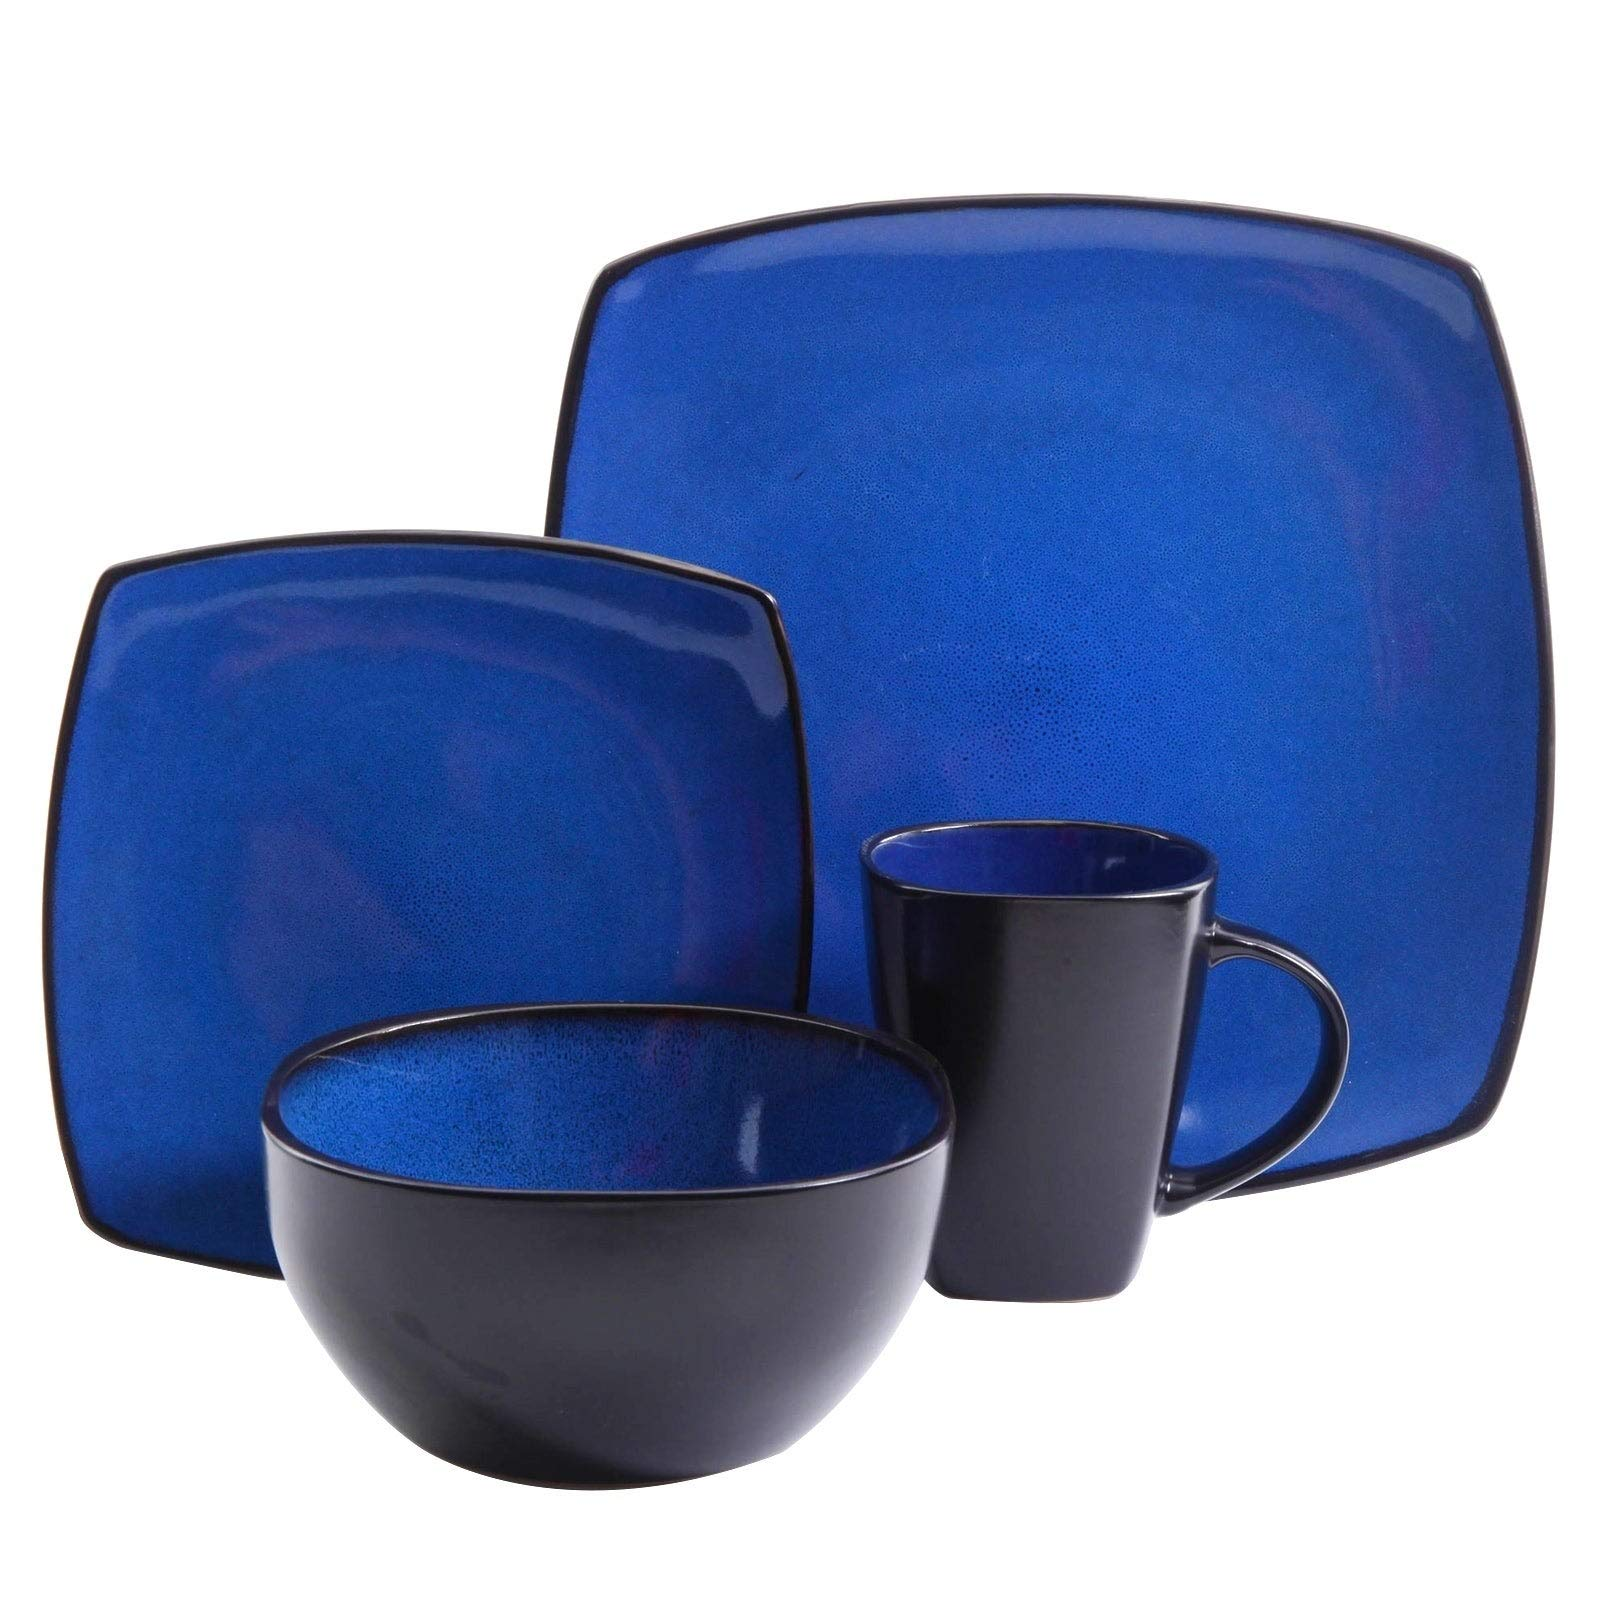 16 PCS Dinnerware Set Square Dinner Plates Mugs Dishes Bowls Home Kitchen Blue